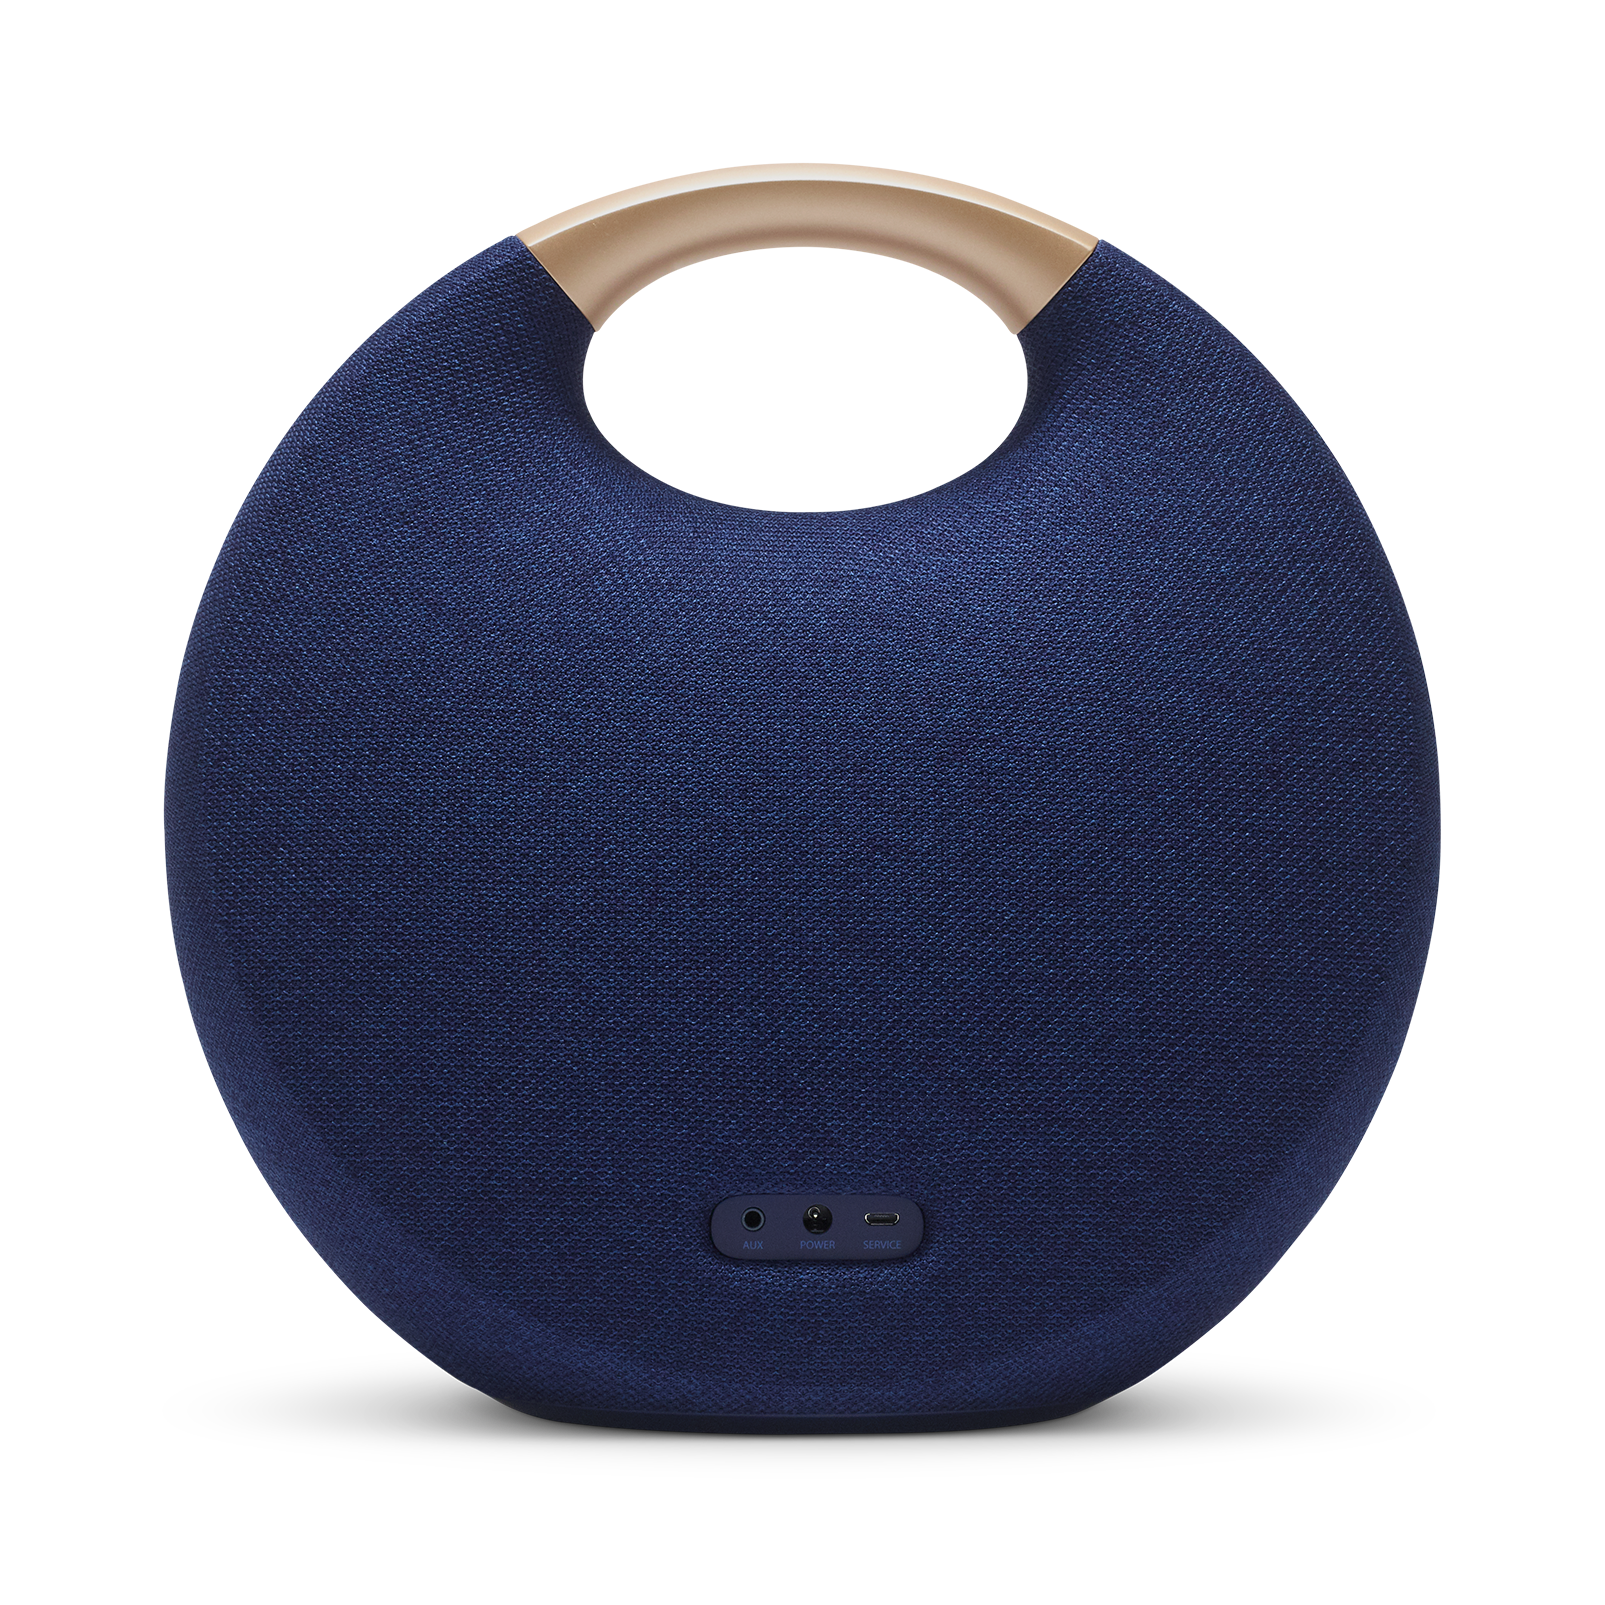 Onyx Studio 5 - Blue - Portable Bluetooth Speaker - Back